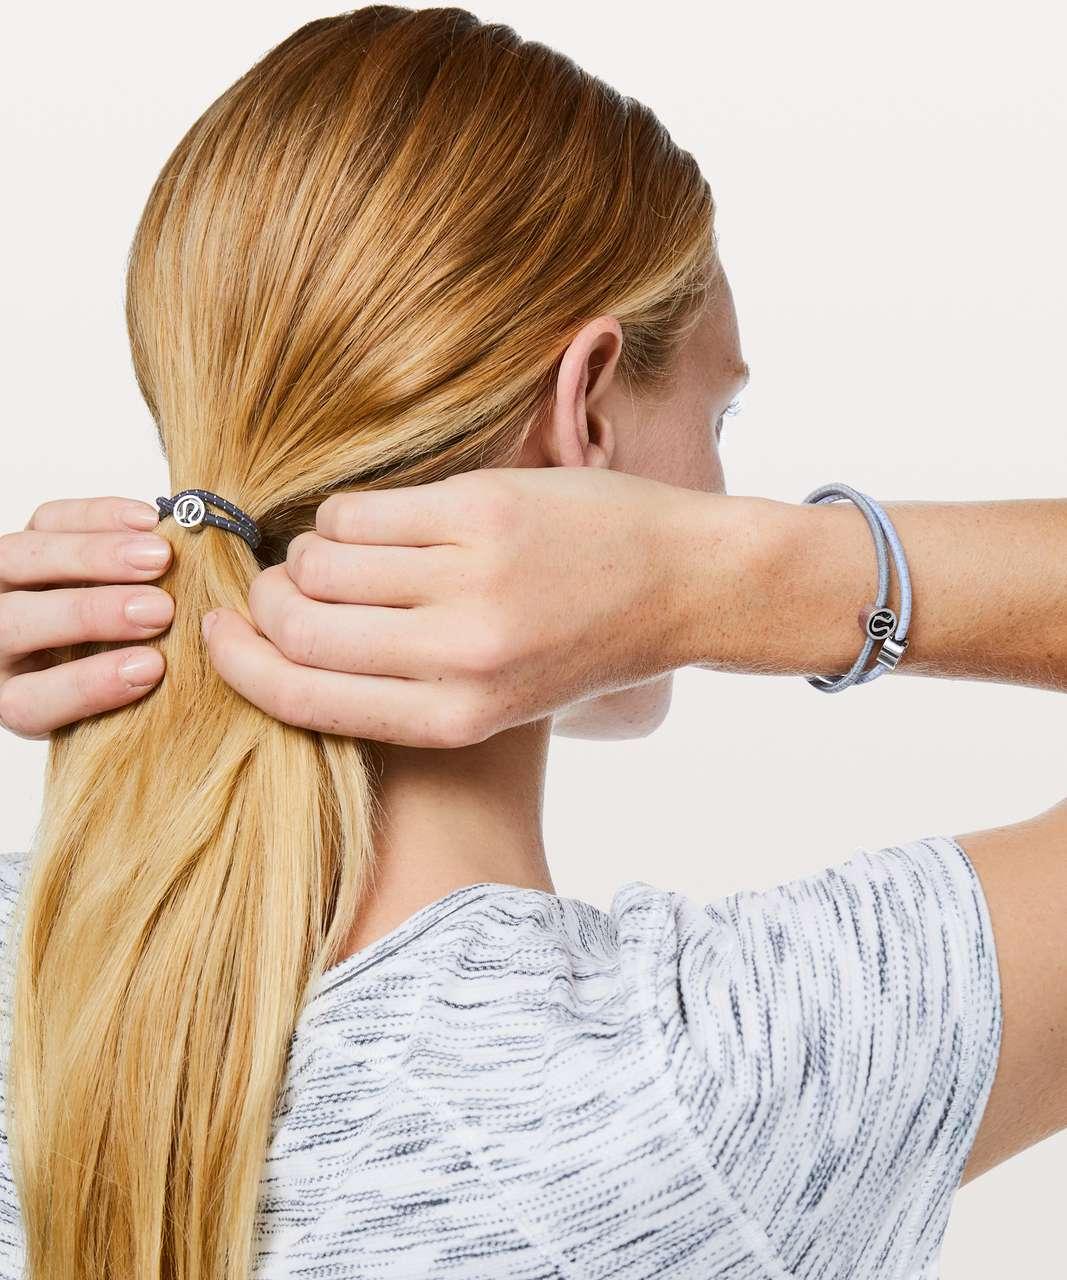 Lululemon Glow On Hair Ties - Lavender Dusk / Cadet Blue / Lilac Stone